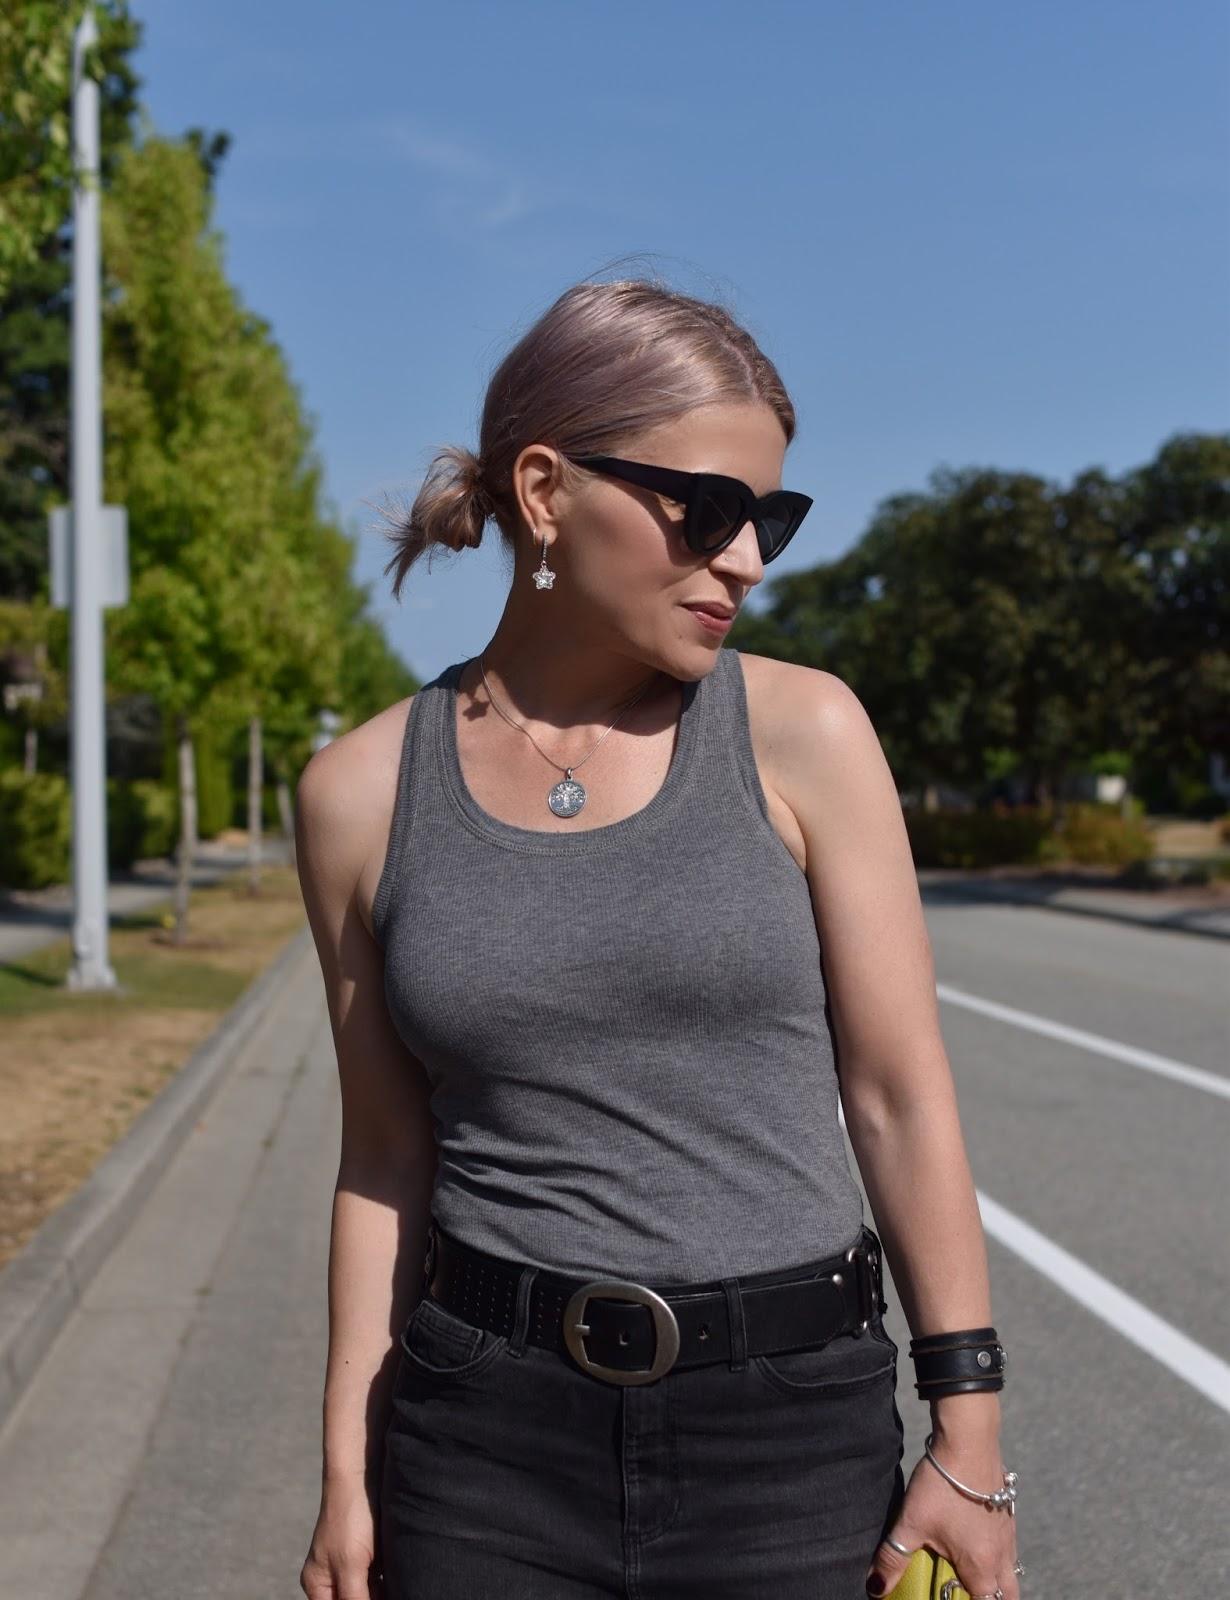 Monika Faulkner outfit inspiration - grey tank top, black denim pencil skirt, cat-eye sunglasses